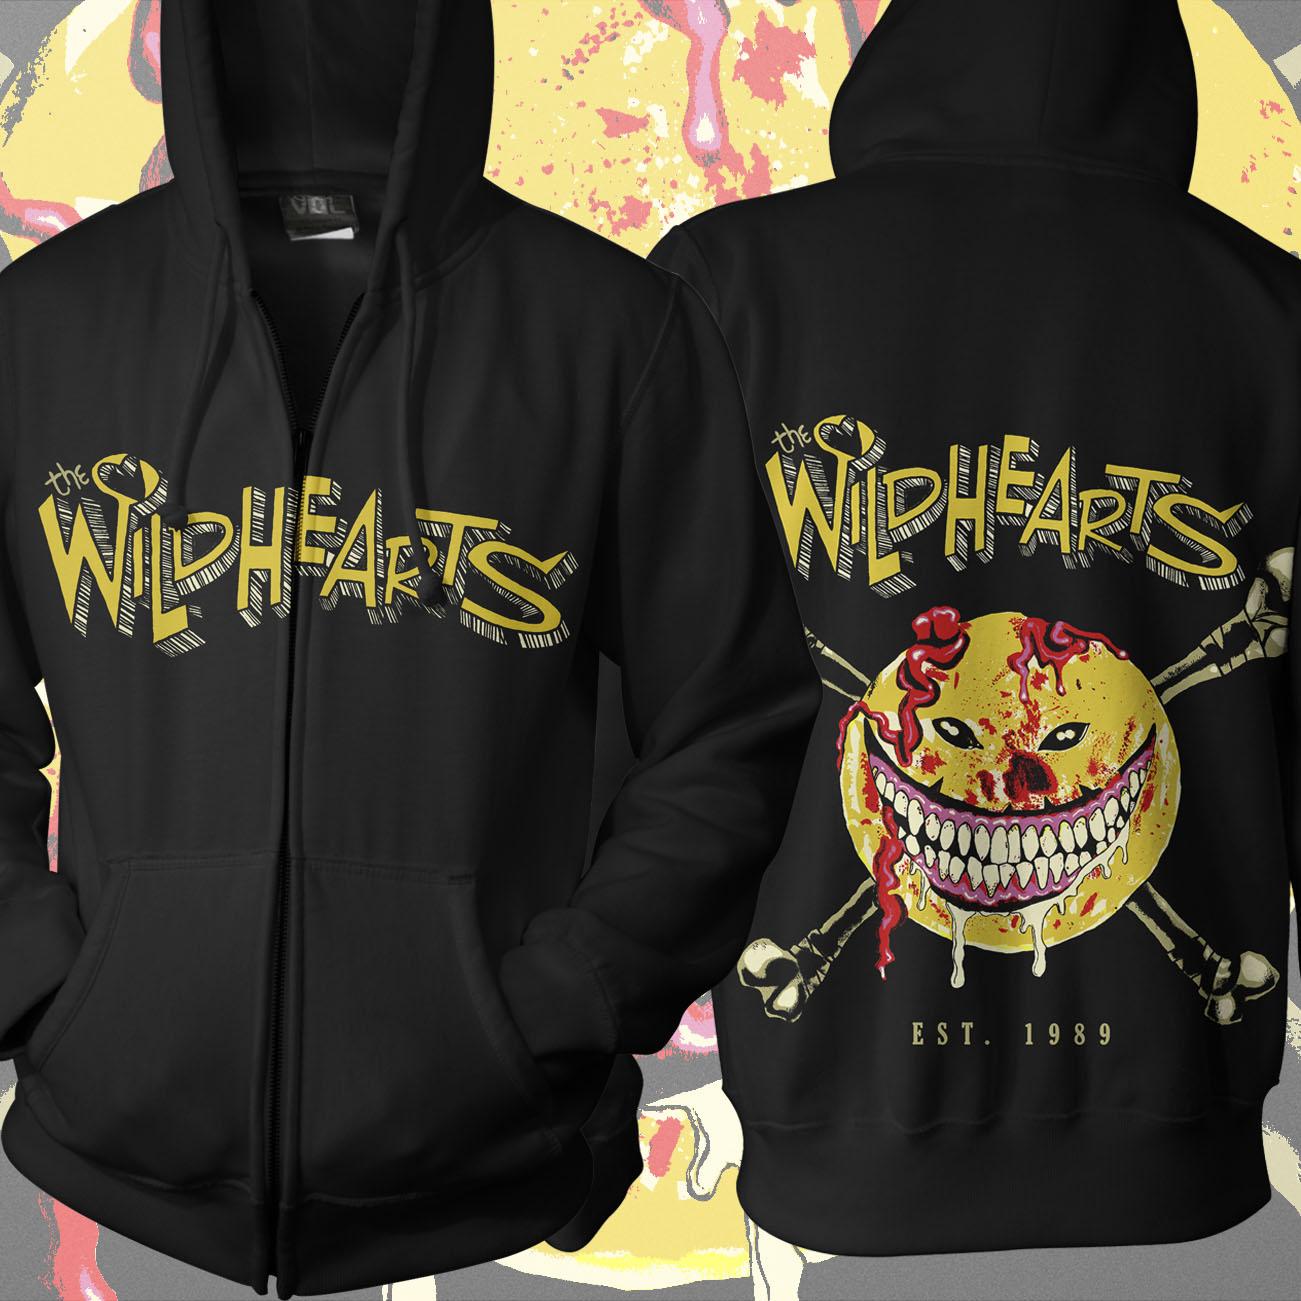 The Wildhearts - 'Smiley' Zip Hoody - The Wildhearts